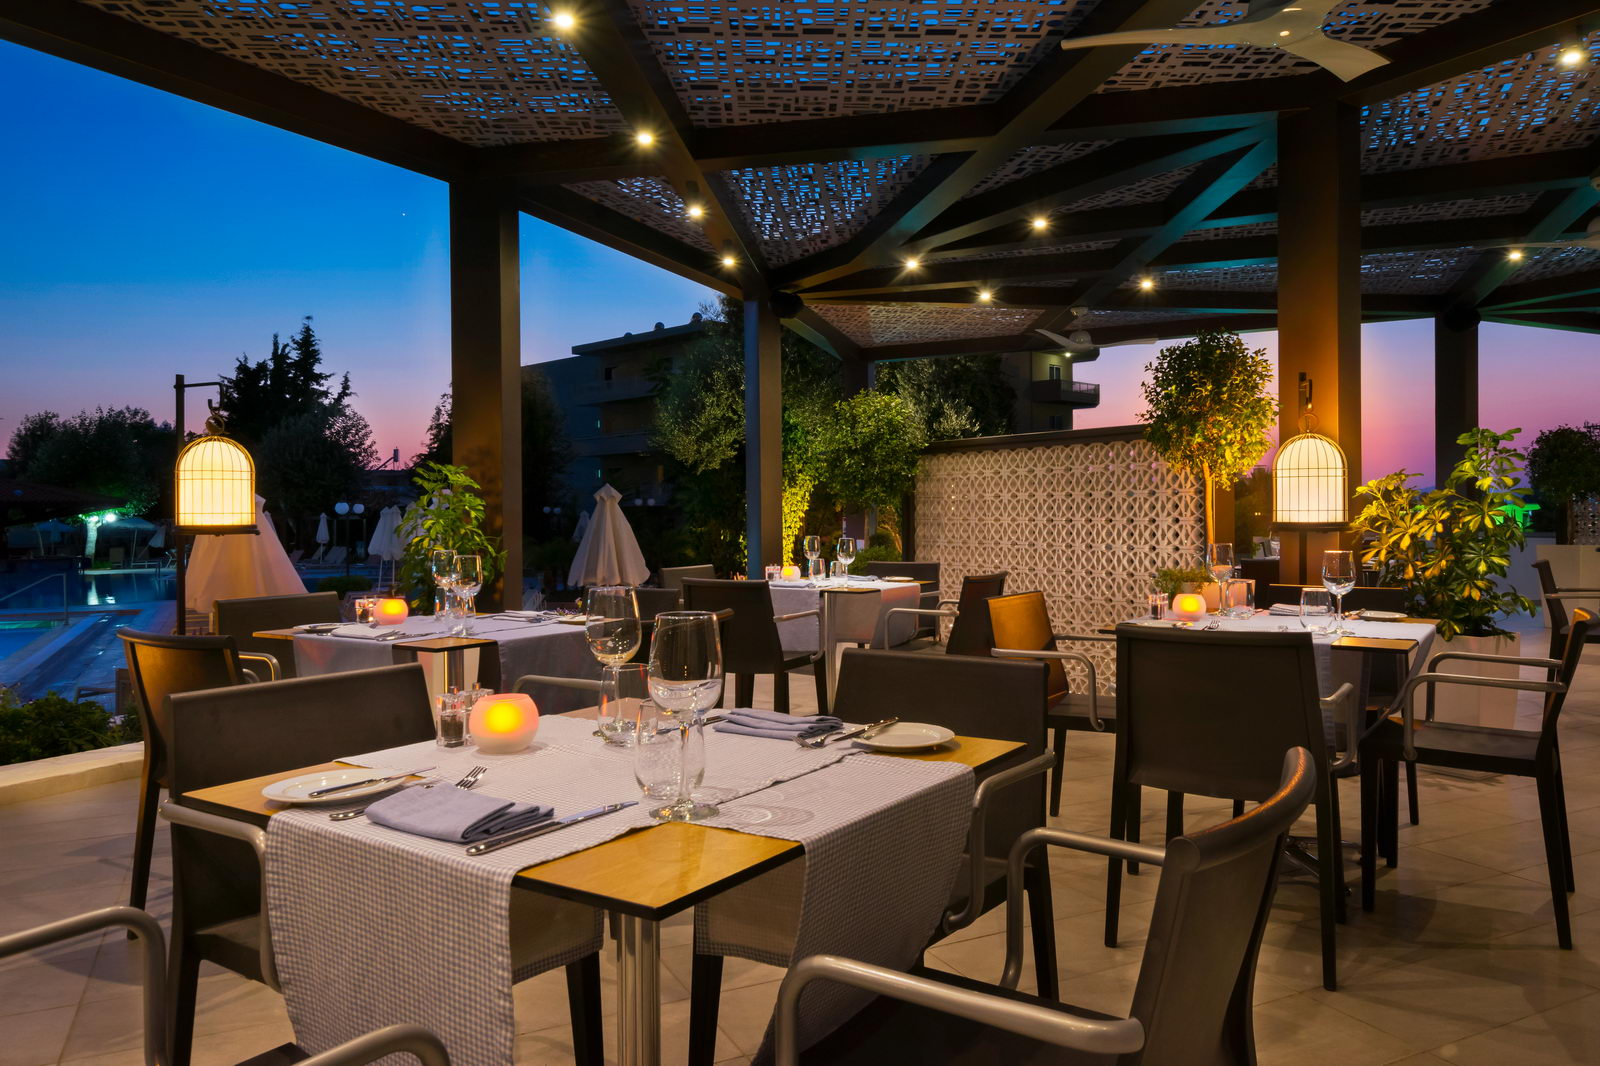 Olympic palace hotel design awards for Design hotel awards